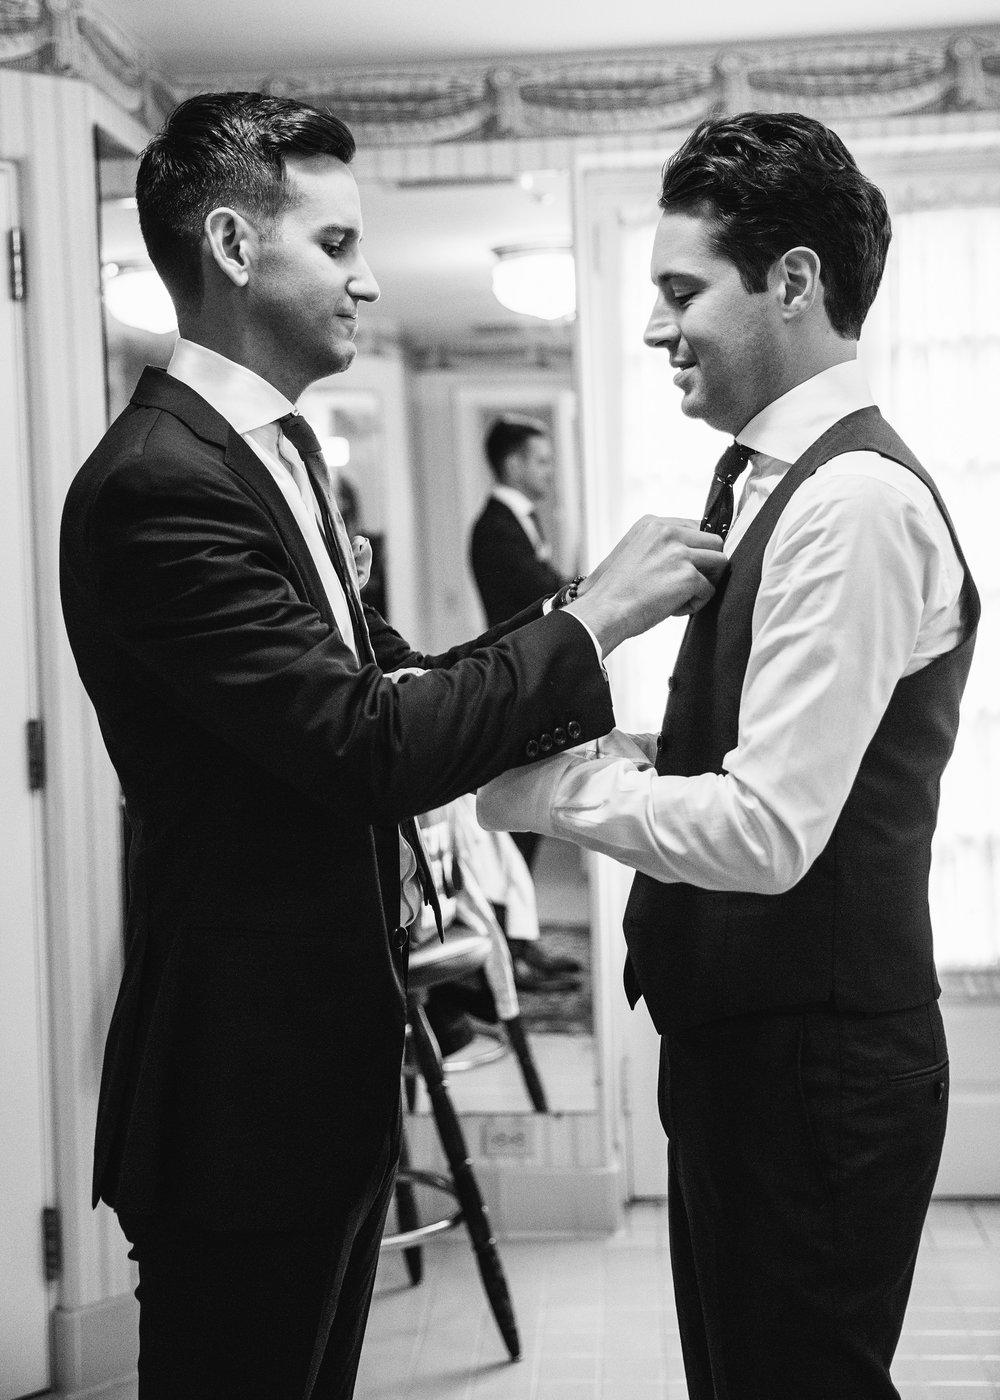 005Hudson-Nichols-Mark-Nick-Gay-Wedding-Same-Sex-Prep-Photos.jpg